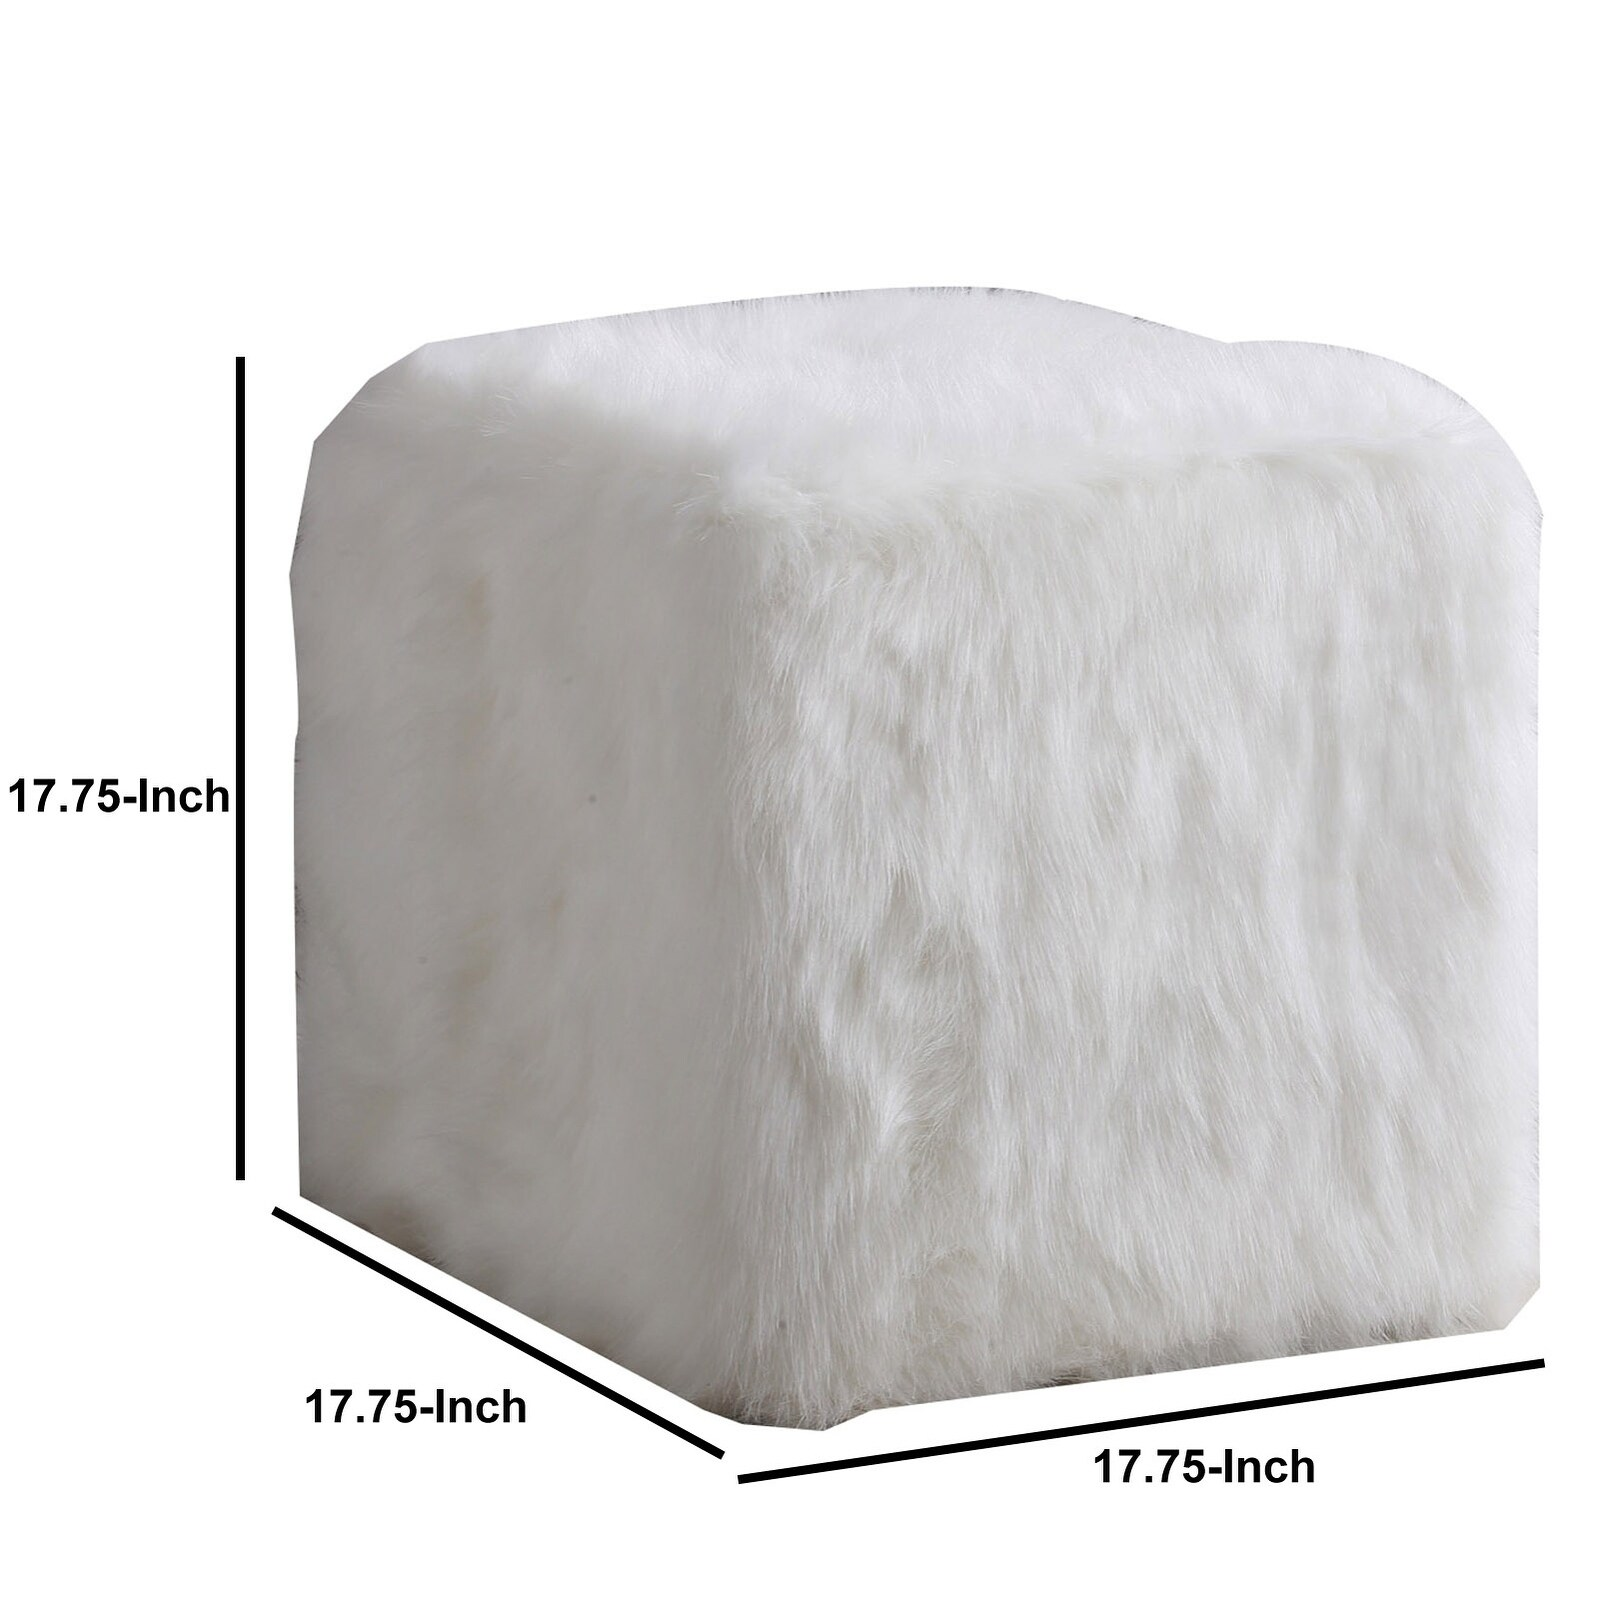 Fantastic Faux Fur Upholstered Wooden Ottoman In Cube Shape White Inzonedesignstudio Interior Chair Design Inzonedesignstudiocom